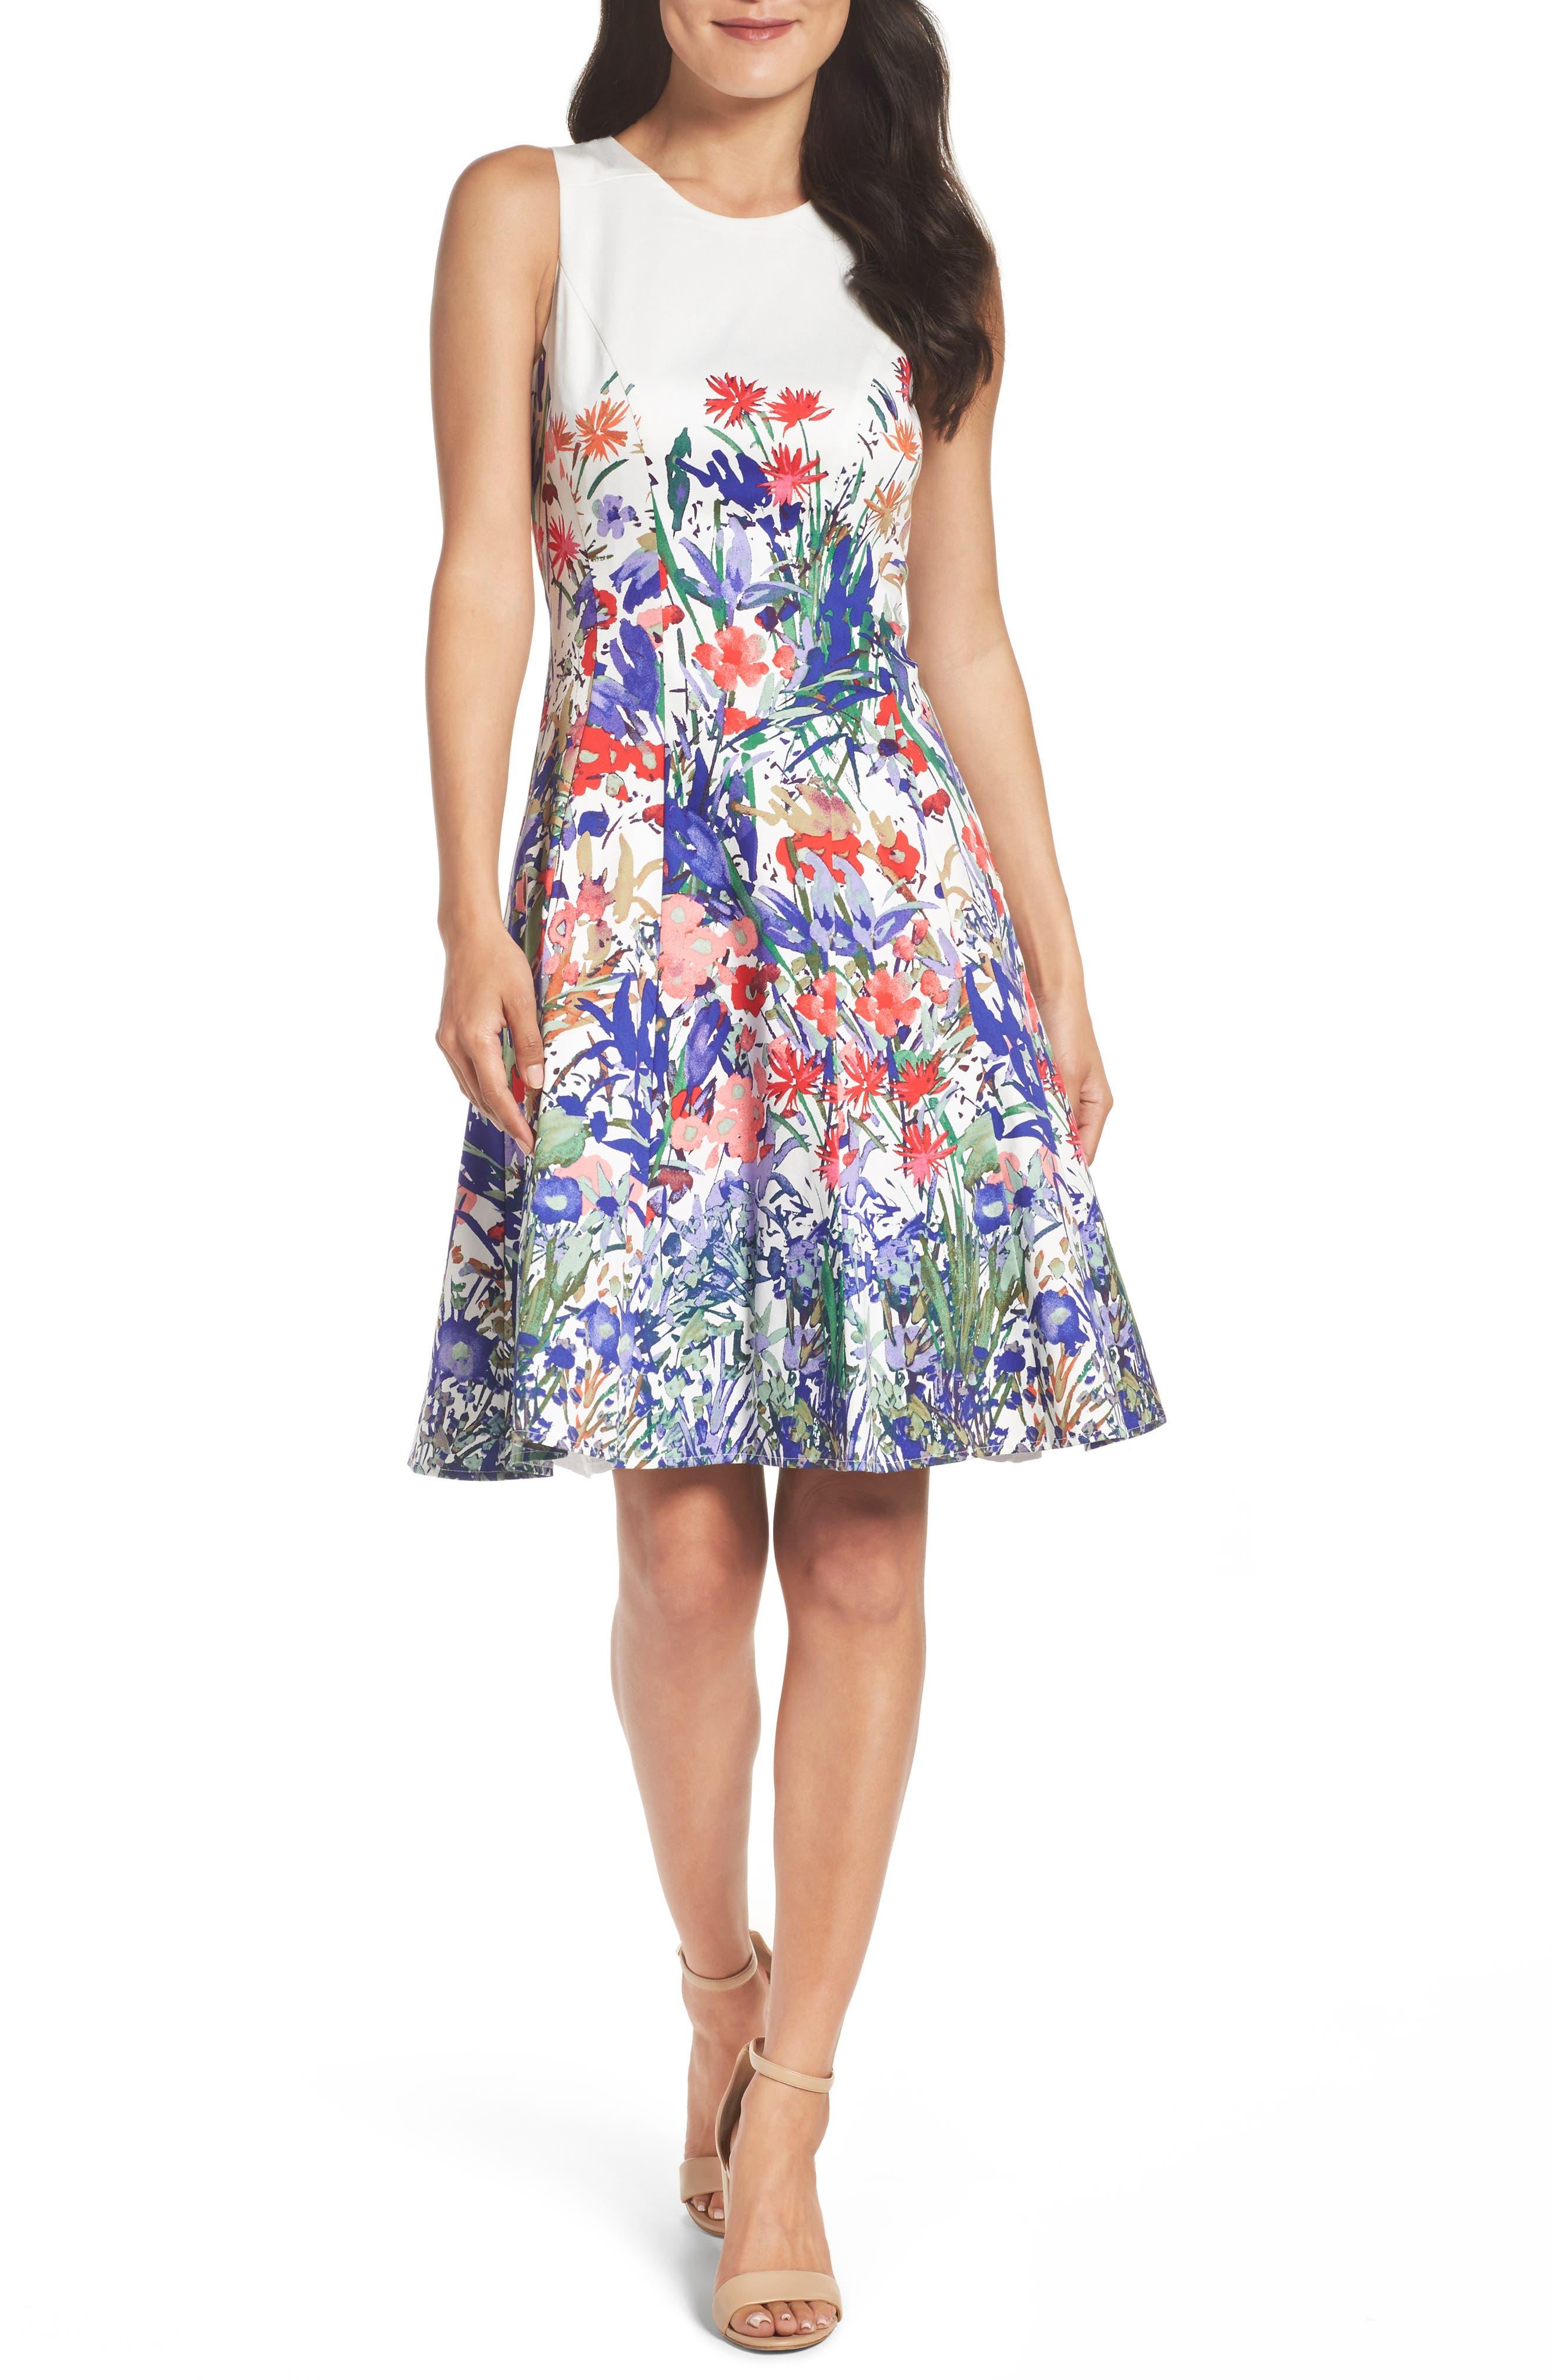 Alternate Image 1 Selected - Maggy London Cottage Garden Fit & Flare Dress (Regular & Petite)